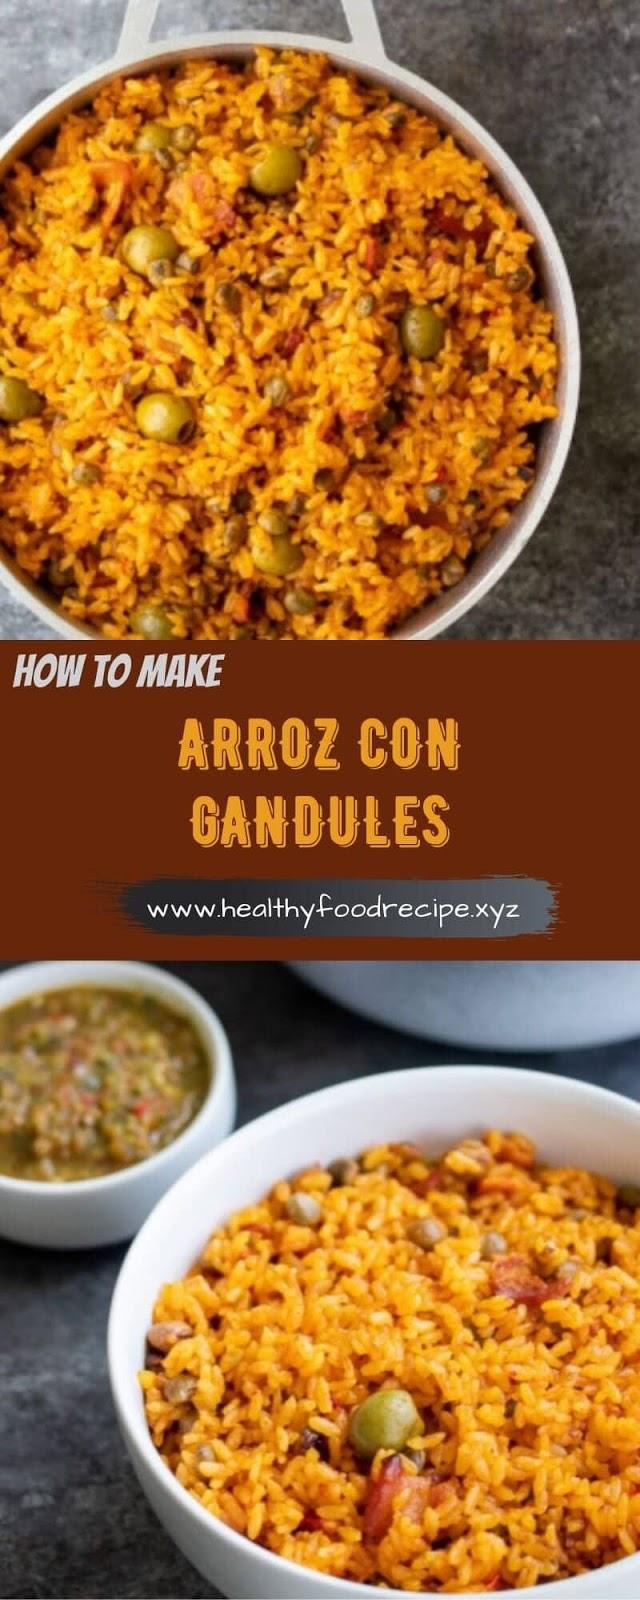 ARROZ CON GANDULES